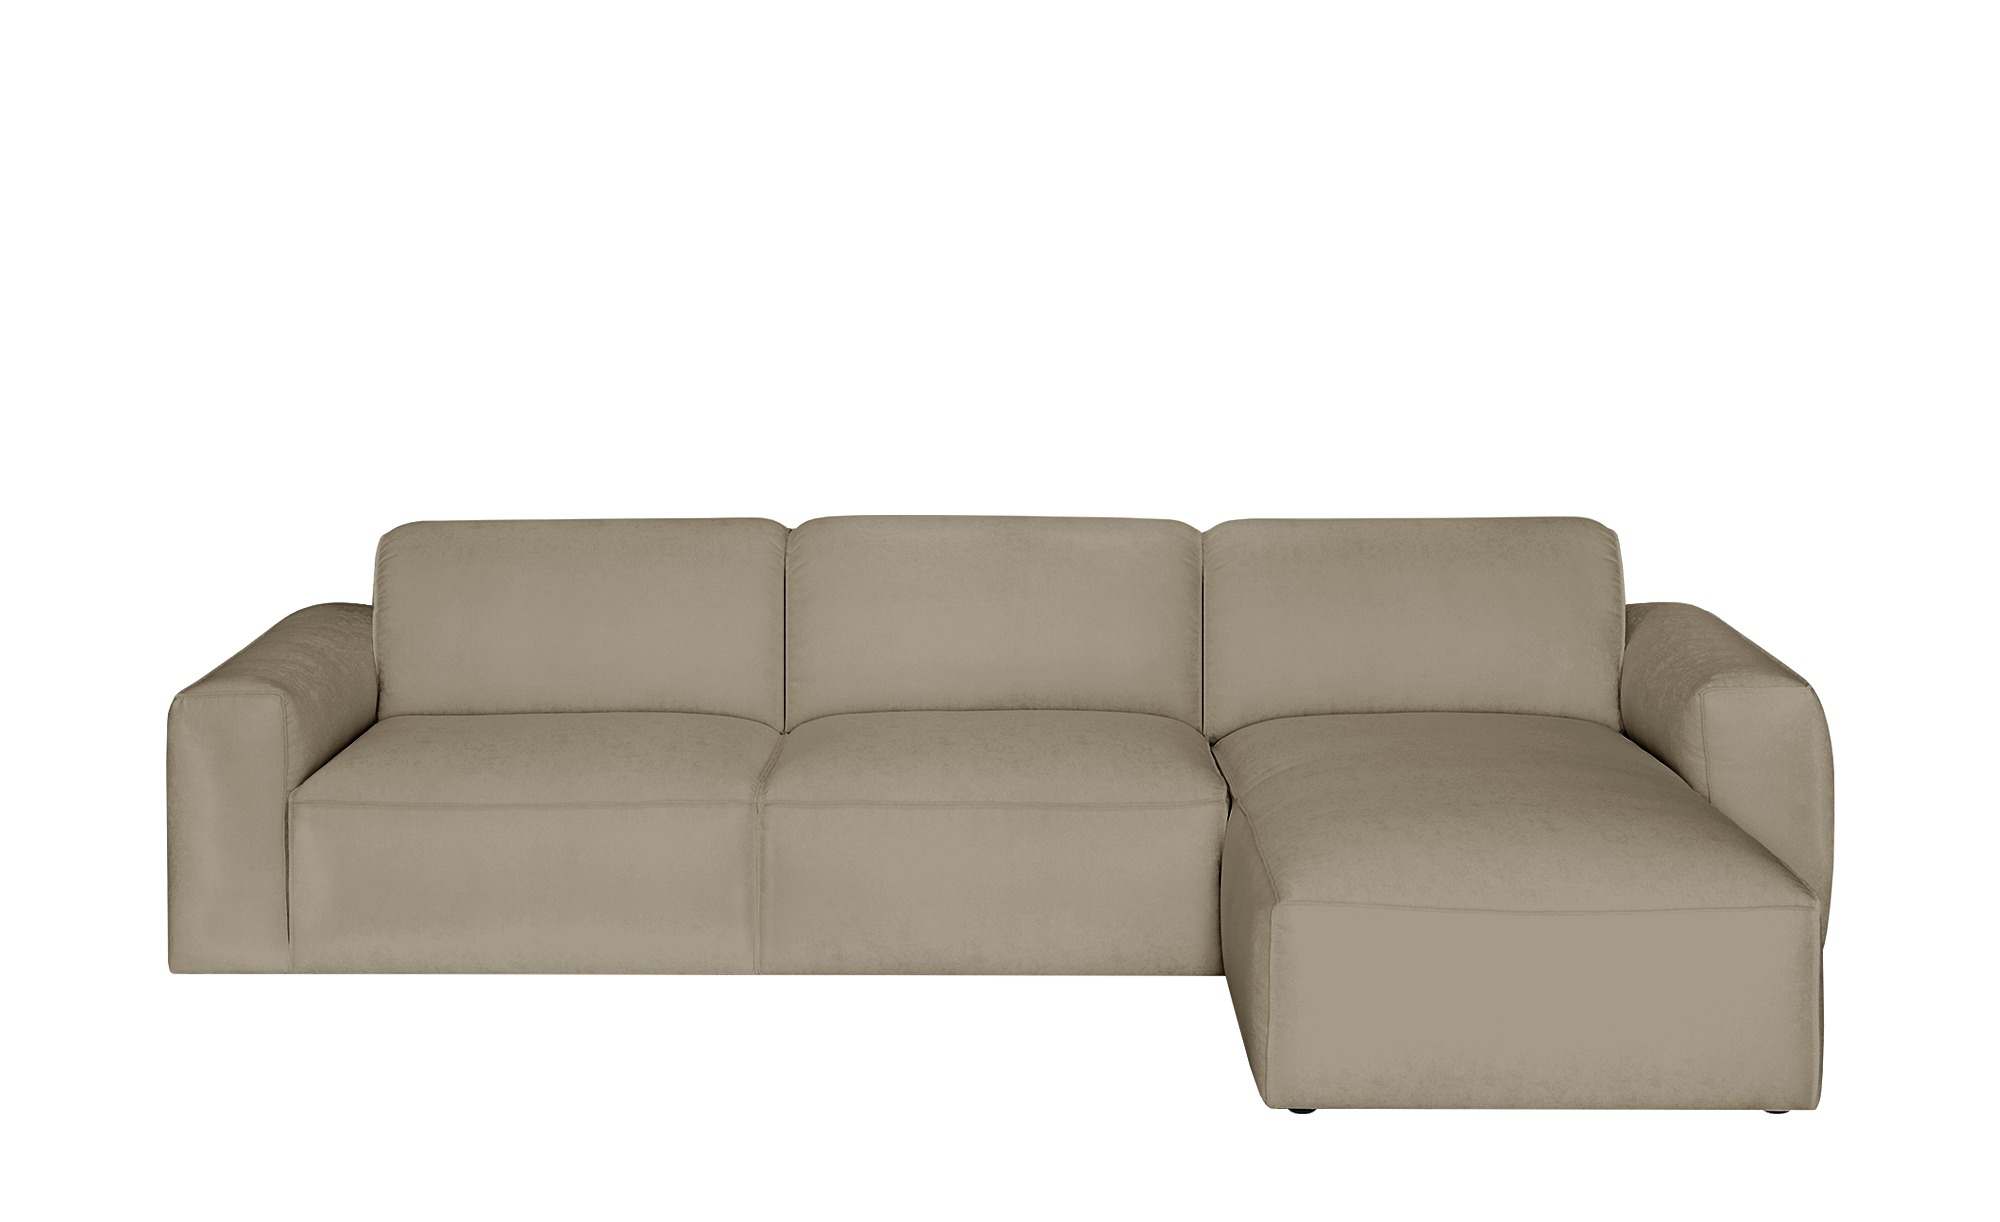 Gray & Jones Ecksofa  Factory ¦ beige ¦ Maße (cm): H: 75 T: 100 Polstermöbel > Sofas > Ecksofas - Höffner